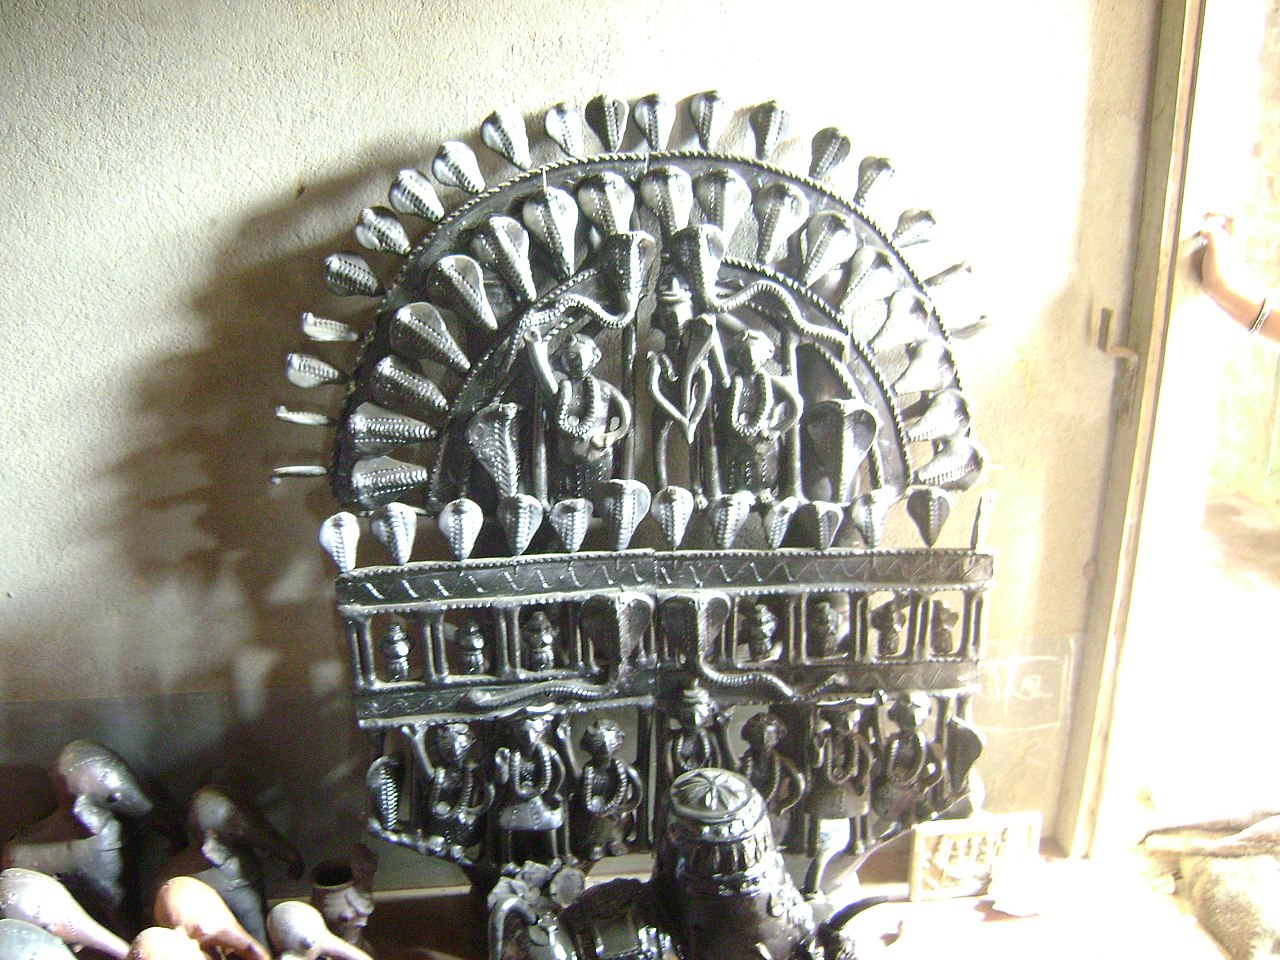 Manasa chali Panchmura মনসা চালি পাঁচমুড়া.jpg